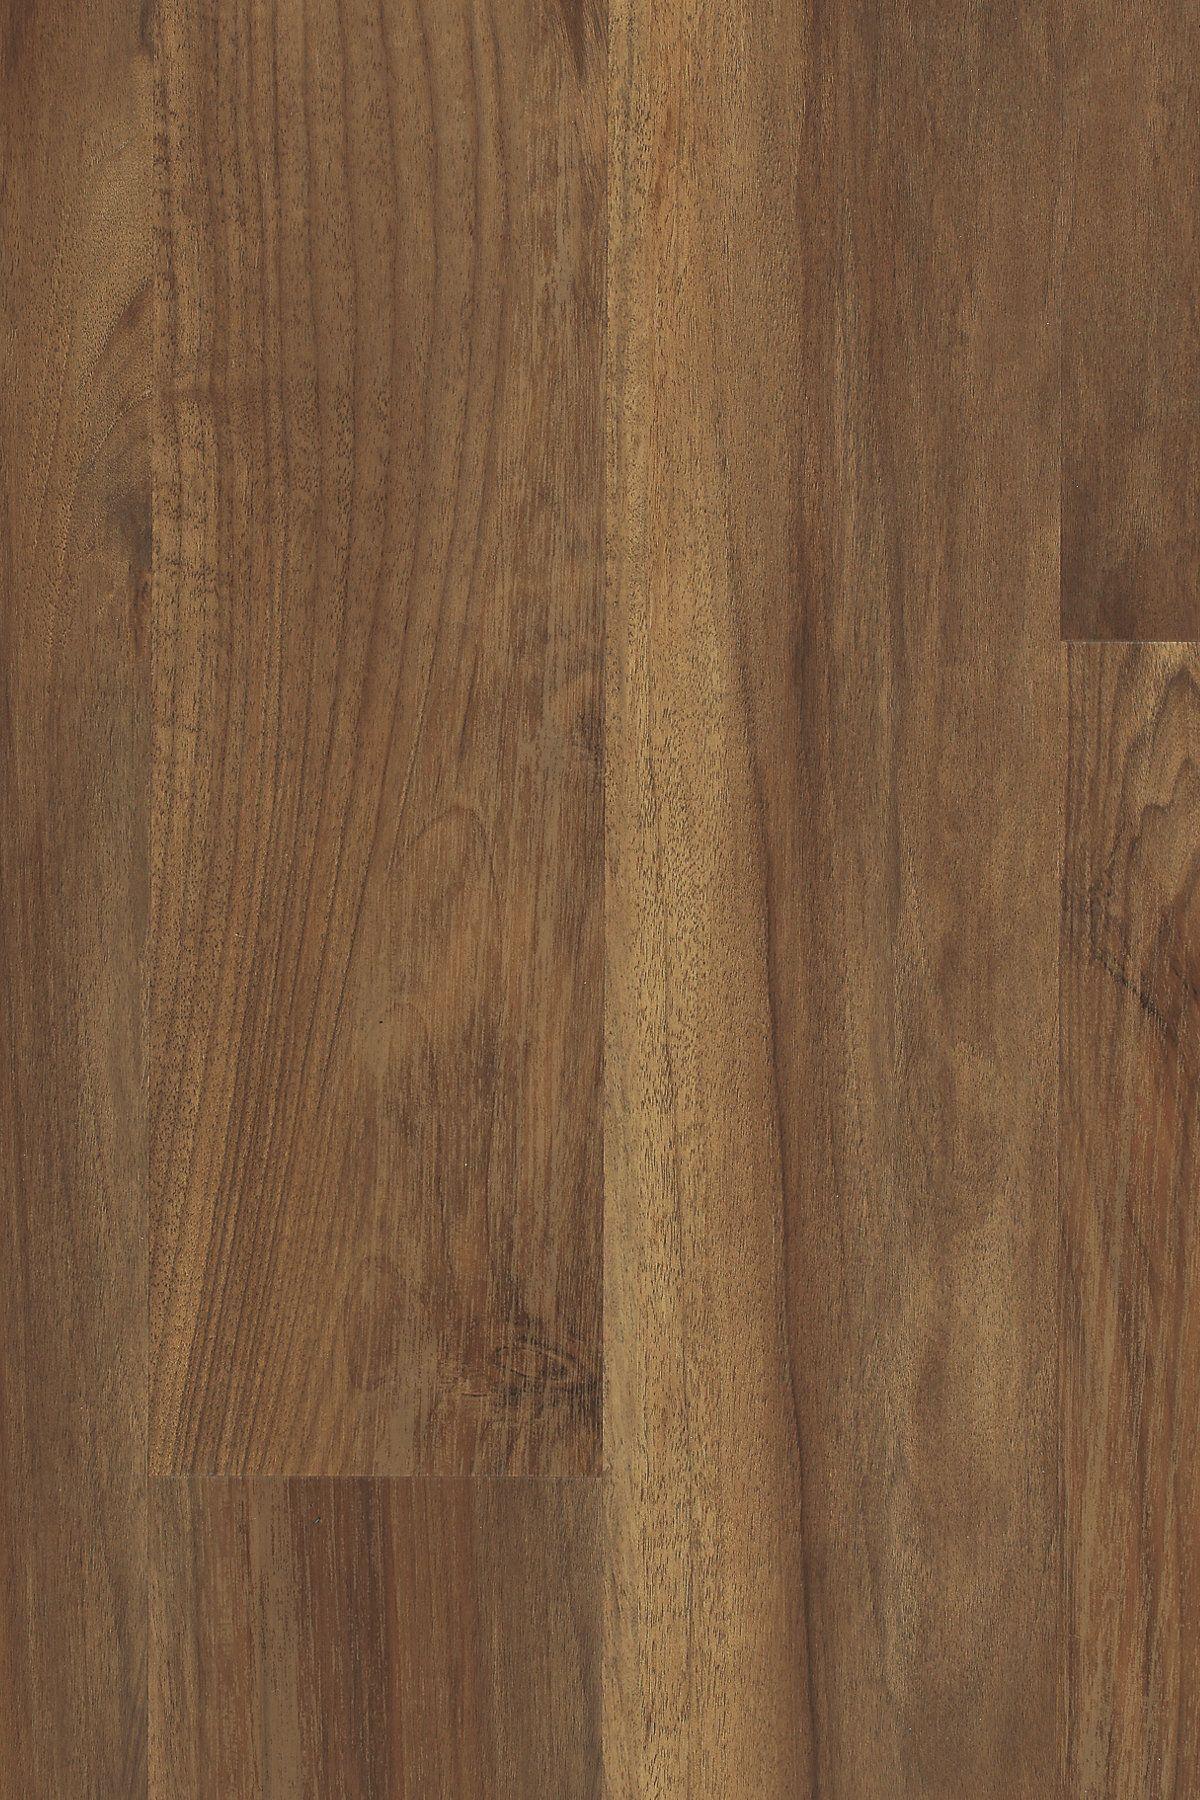 Paramount 512c Plus 509sa Ginger Oak Resilient Vinyl Flooring Vinyl Plank Lvt In 2020 Vinyl Flooring Shaw Floors Durable Flooring